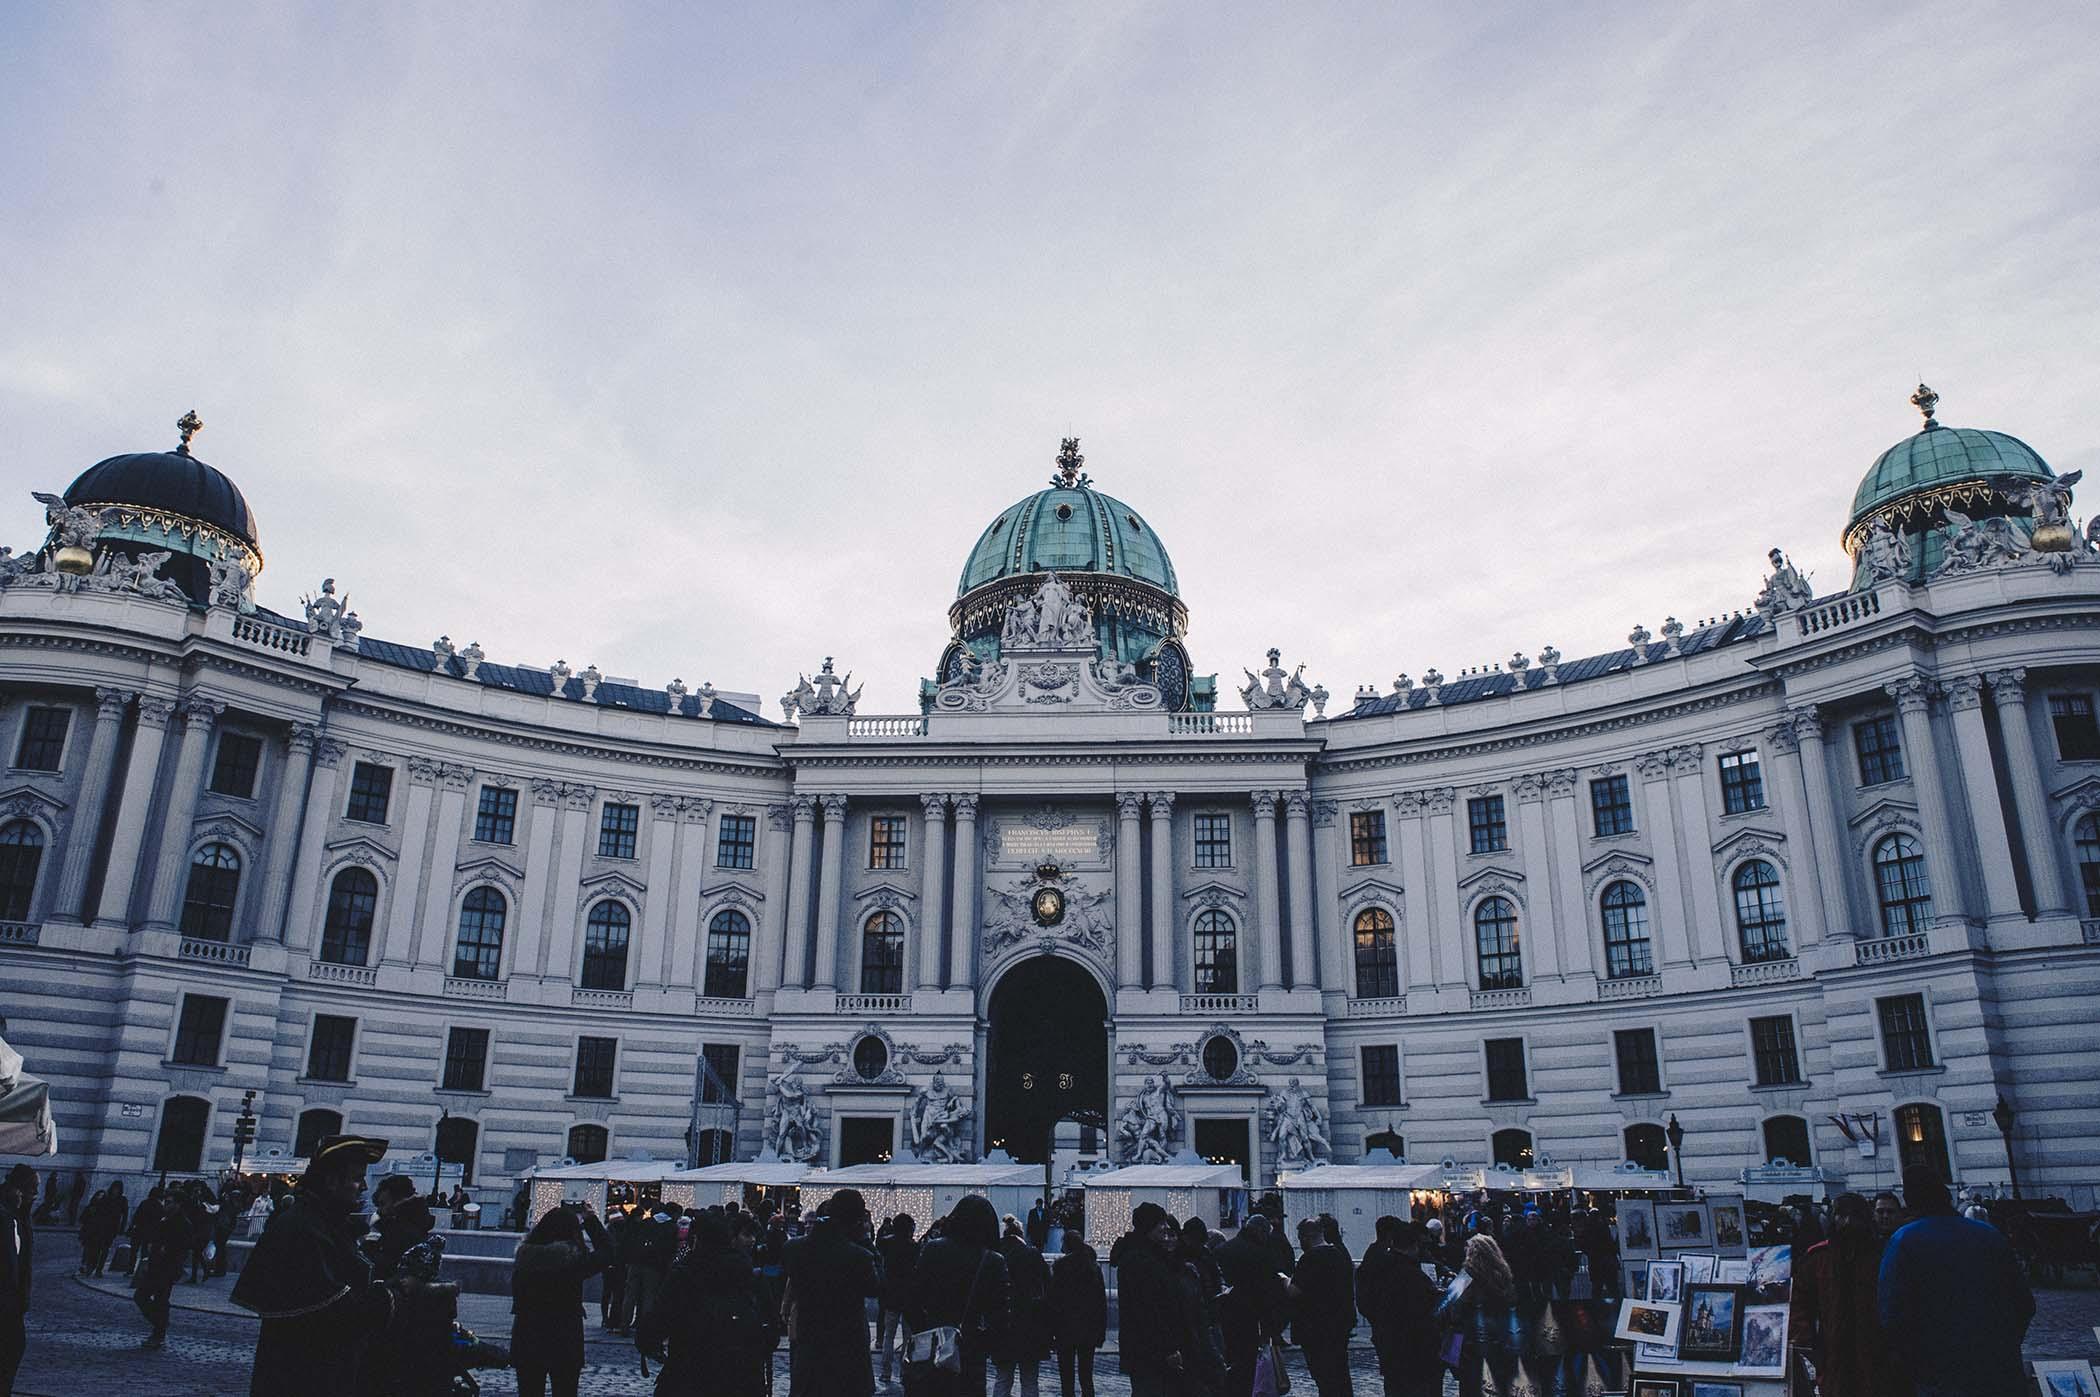 The Vienna Hofburg: Austria's Imperial Palace